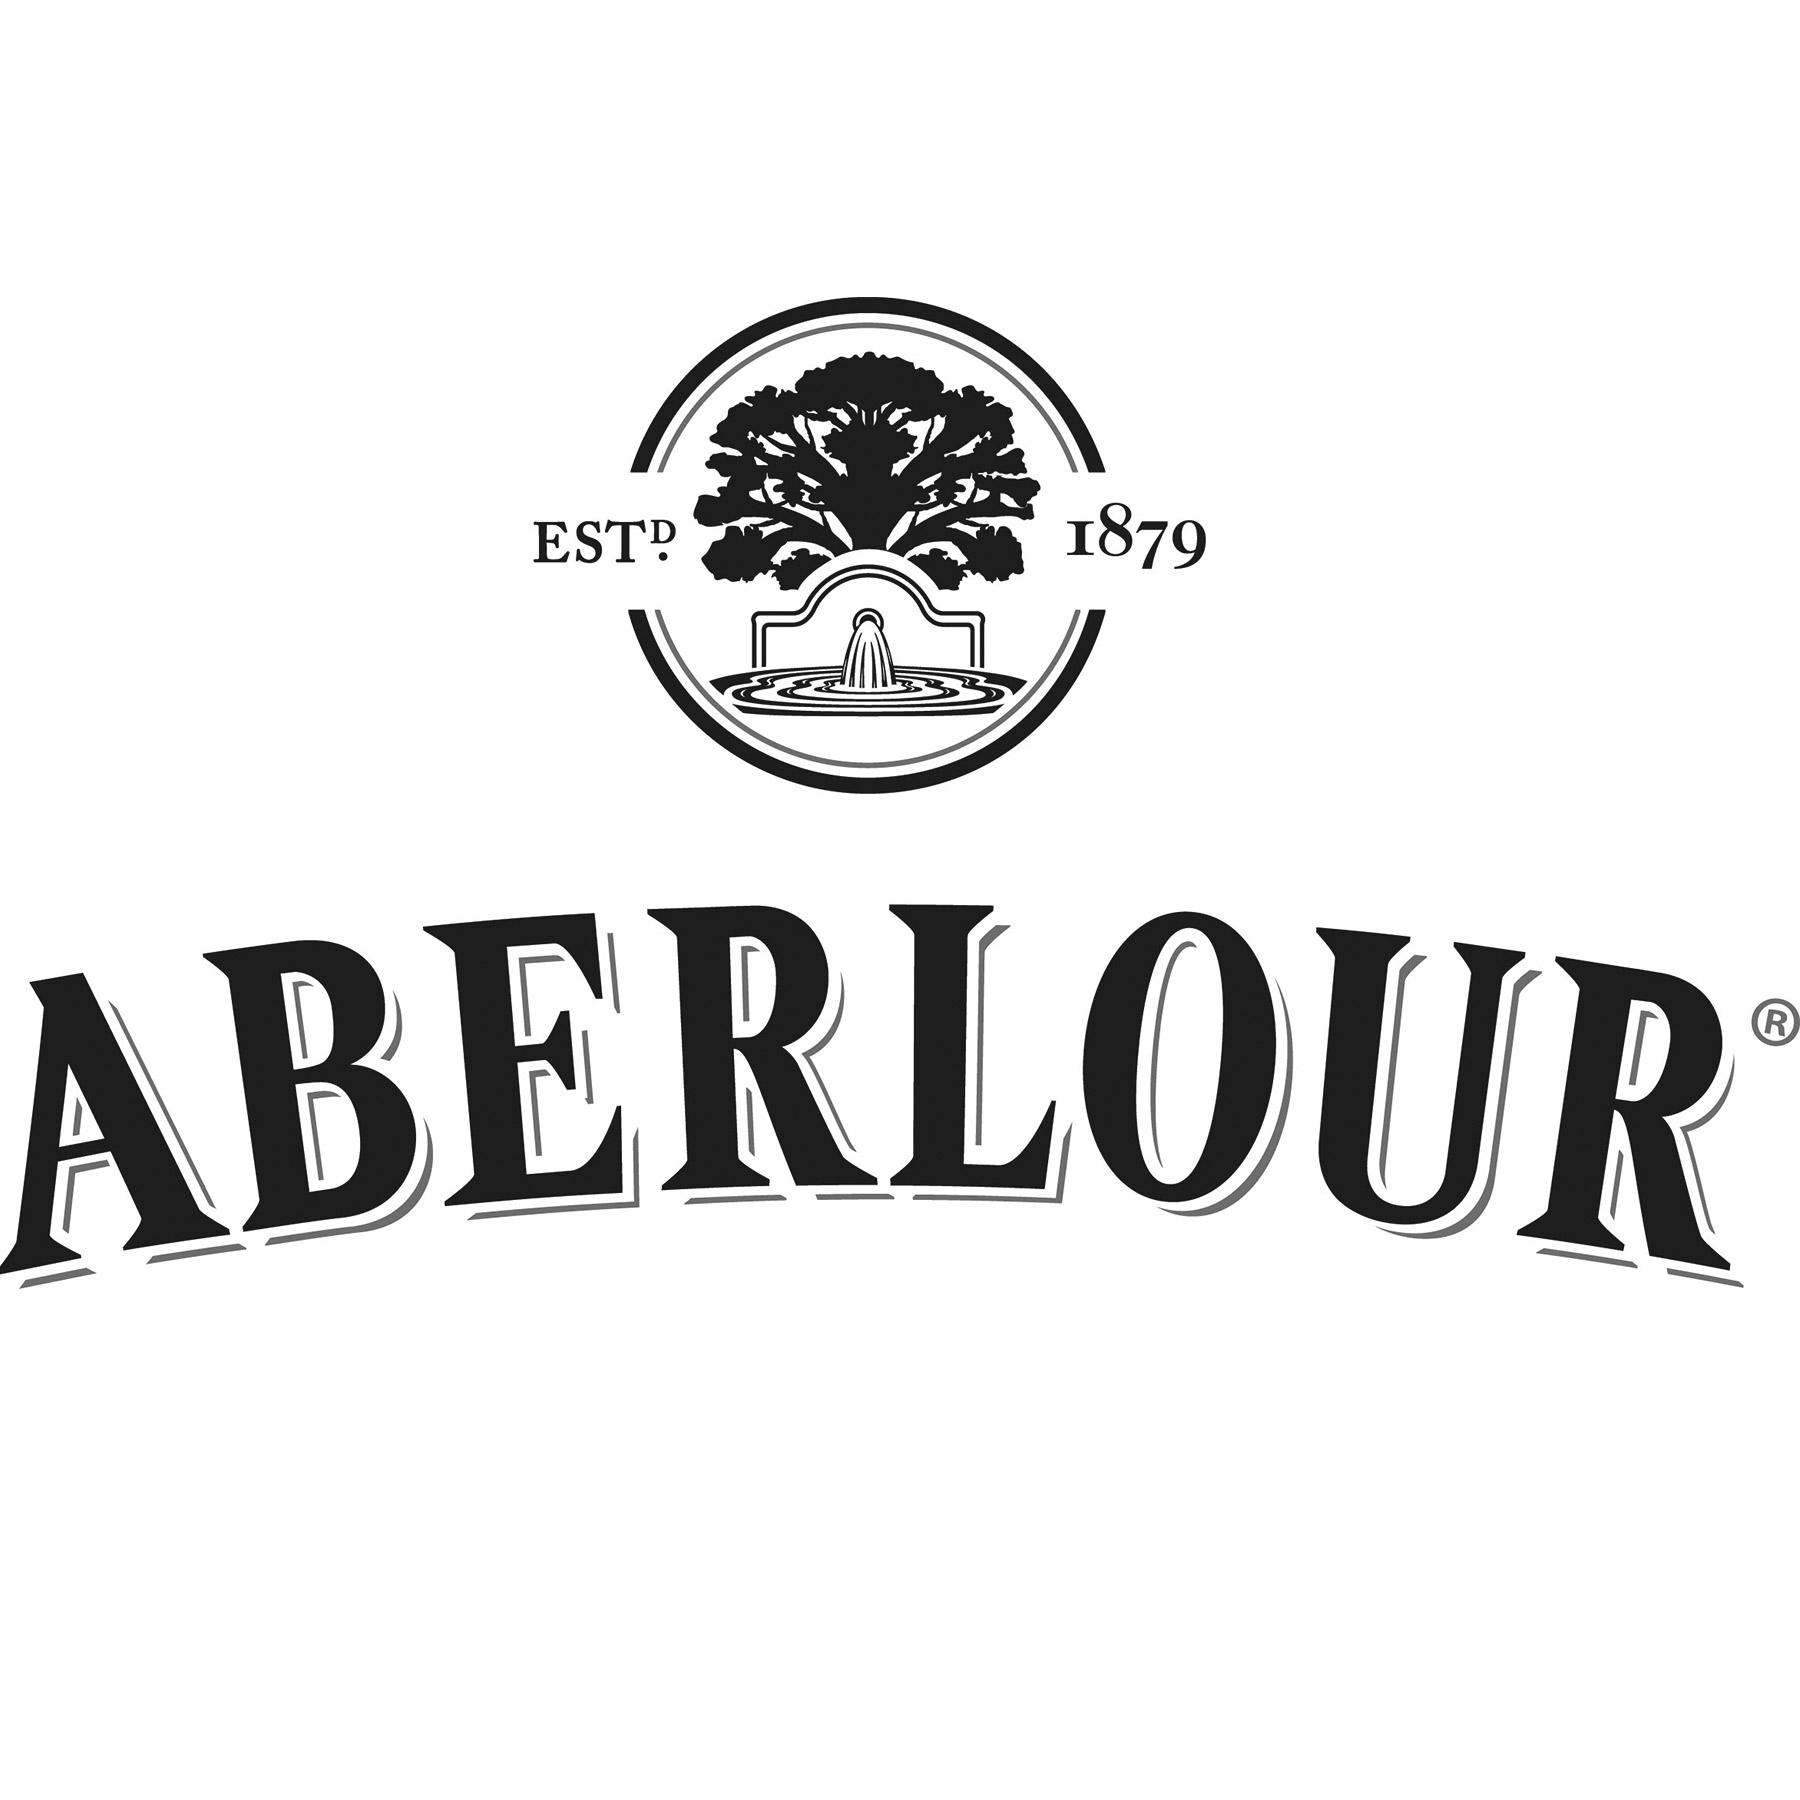 aberlour-B&W.jpg